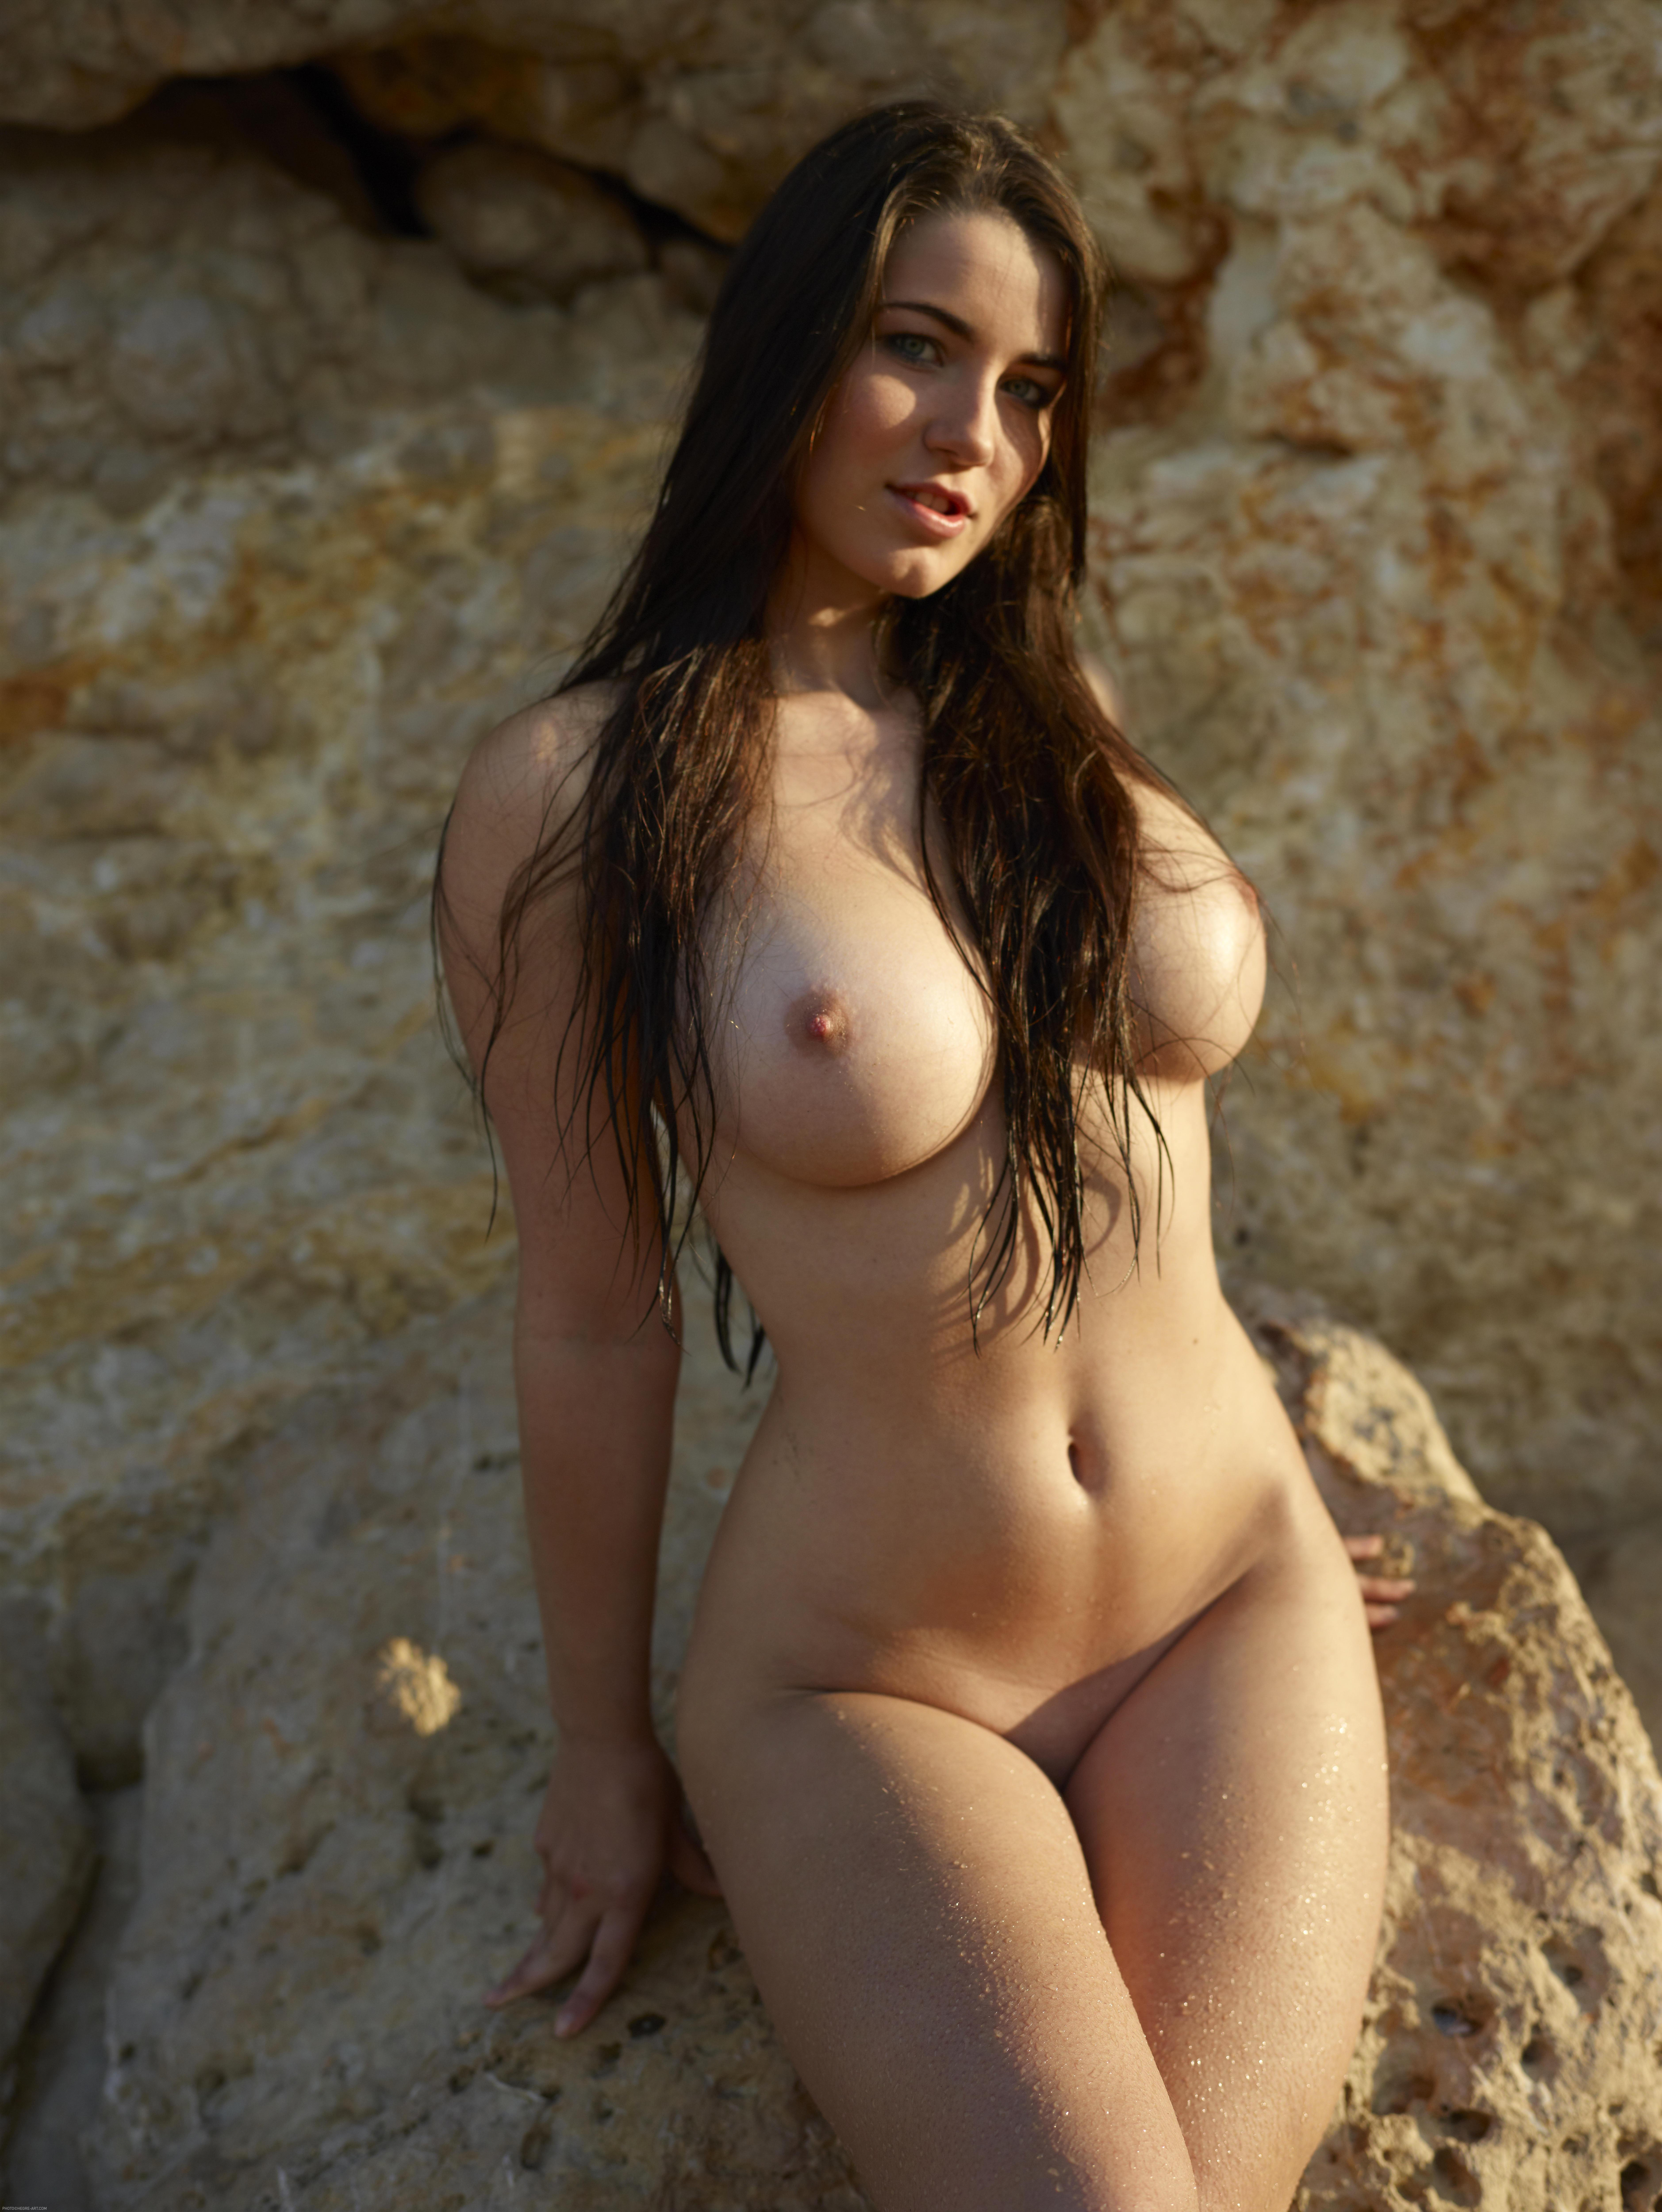 butiful girls big tits sexy pics